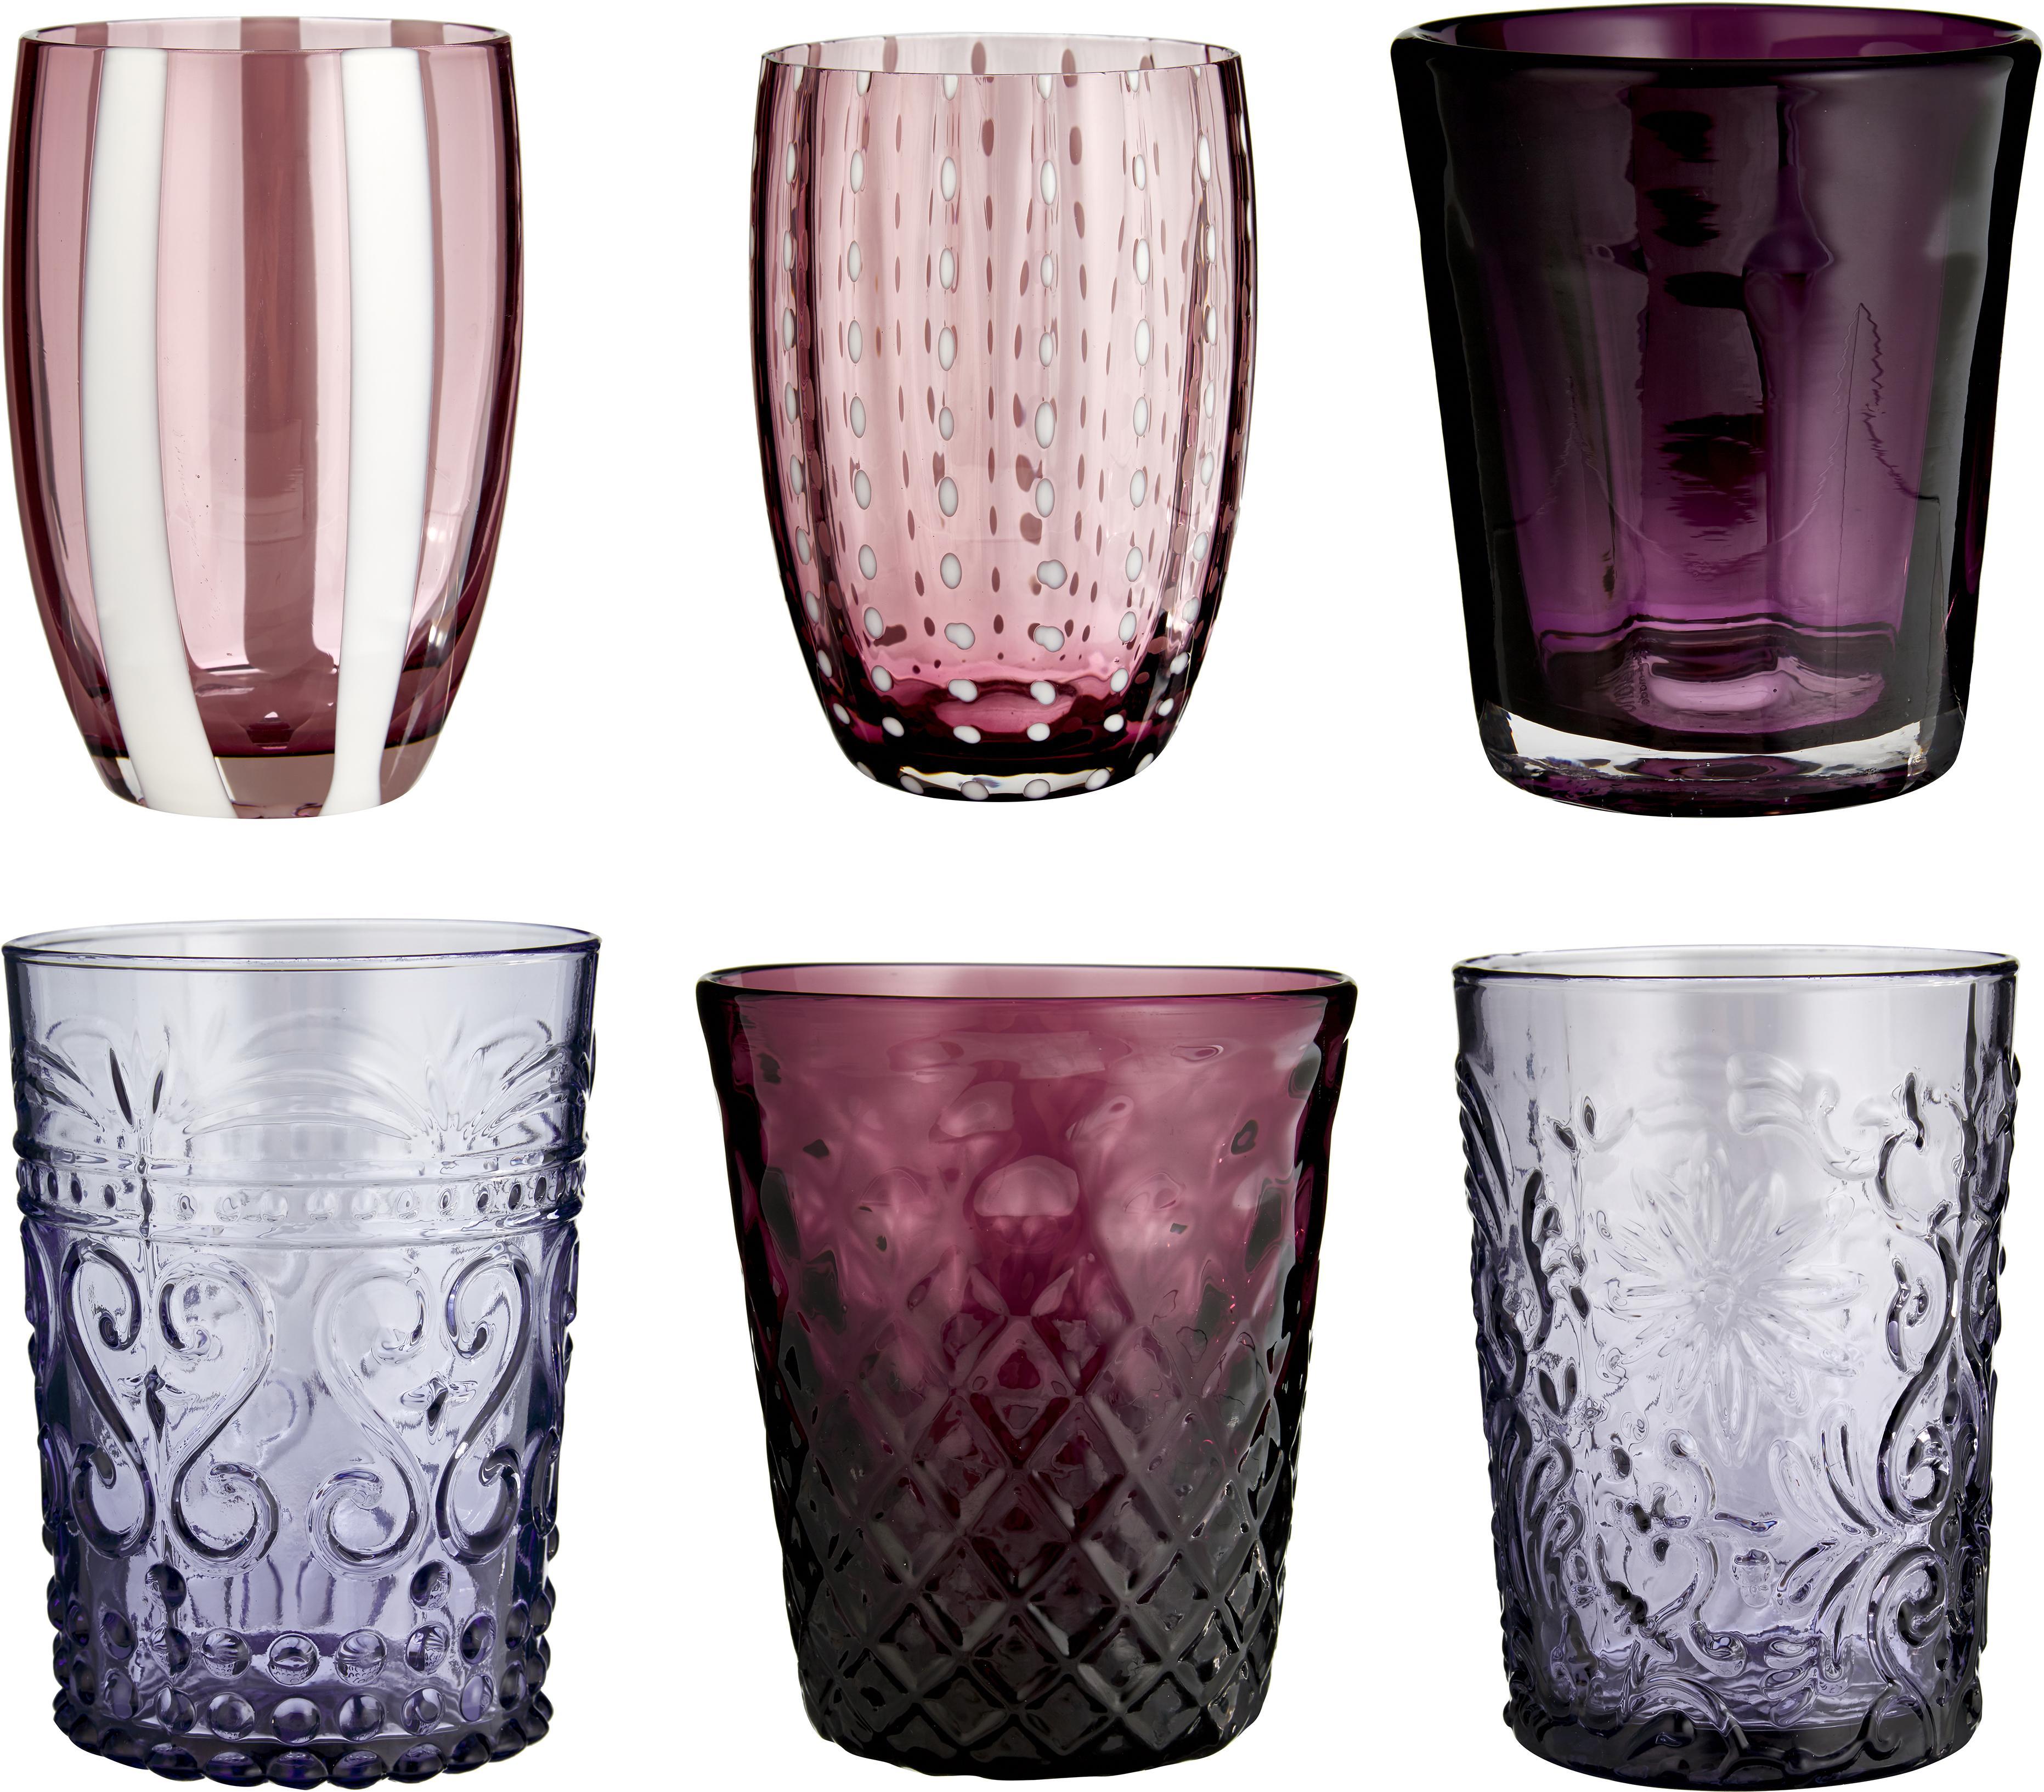 Vasos de vidrio soplado Melting Pot Berry, 6uds., Vidrio, Azul, rojo, Tamaños diferentes